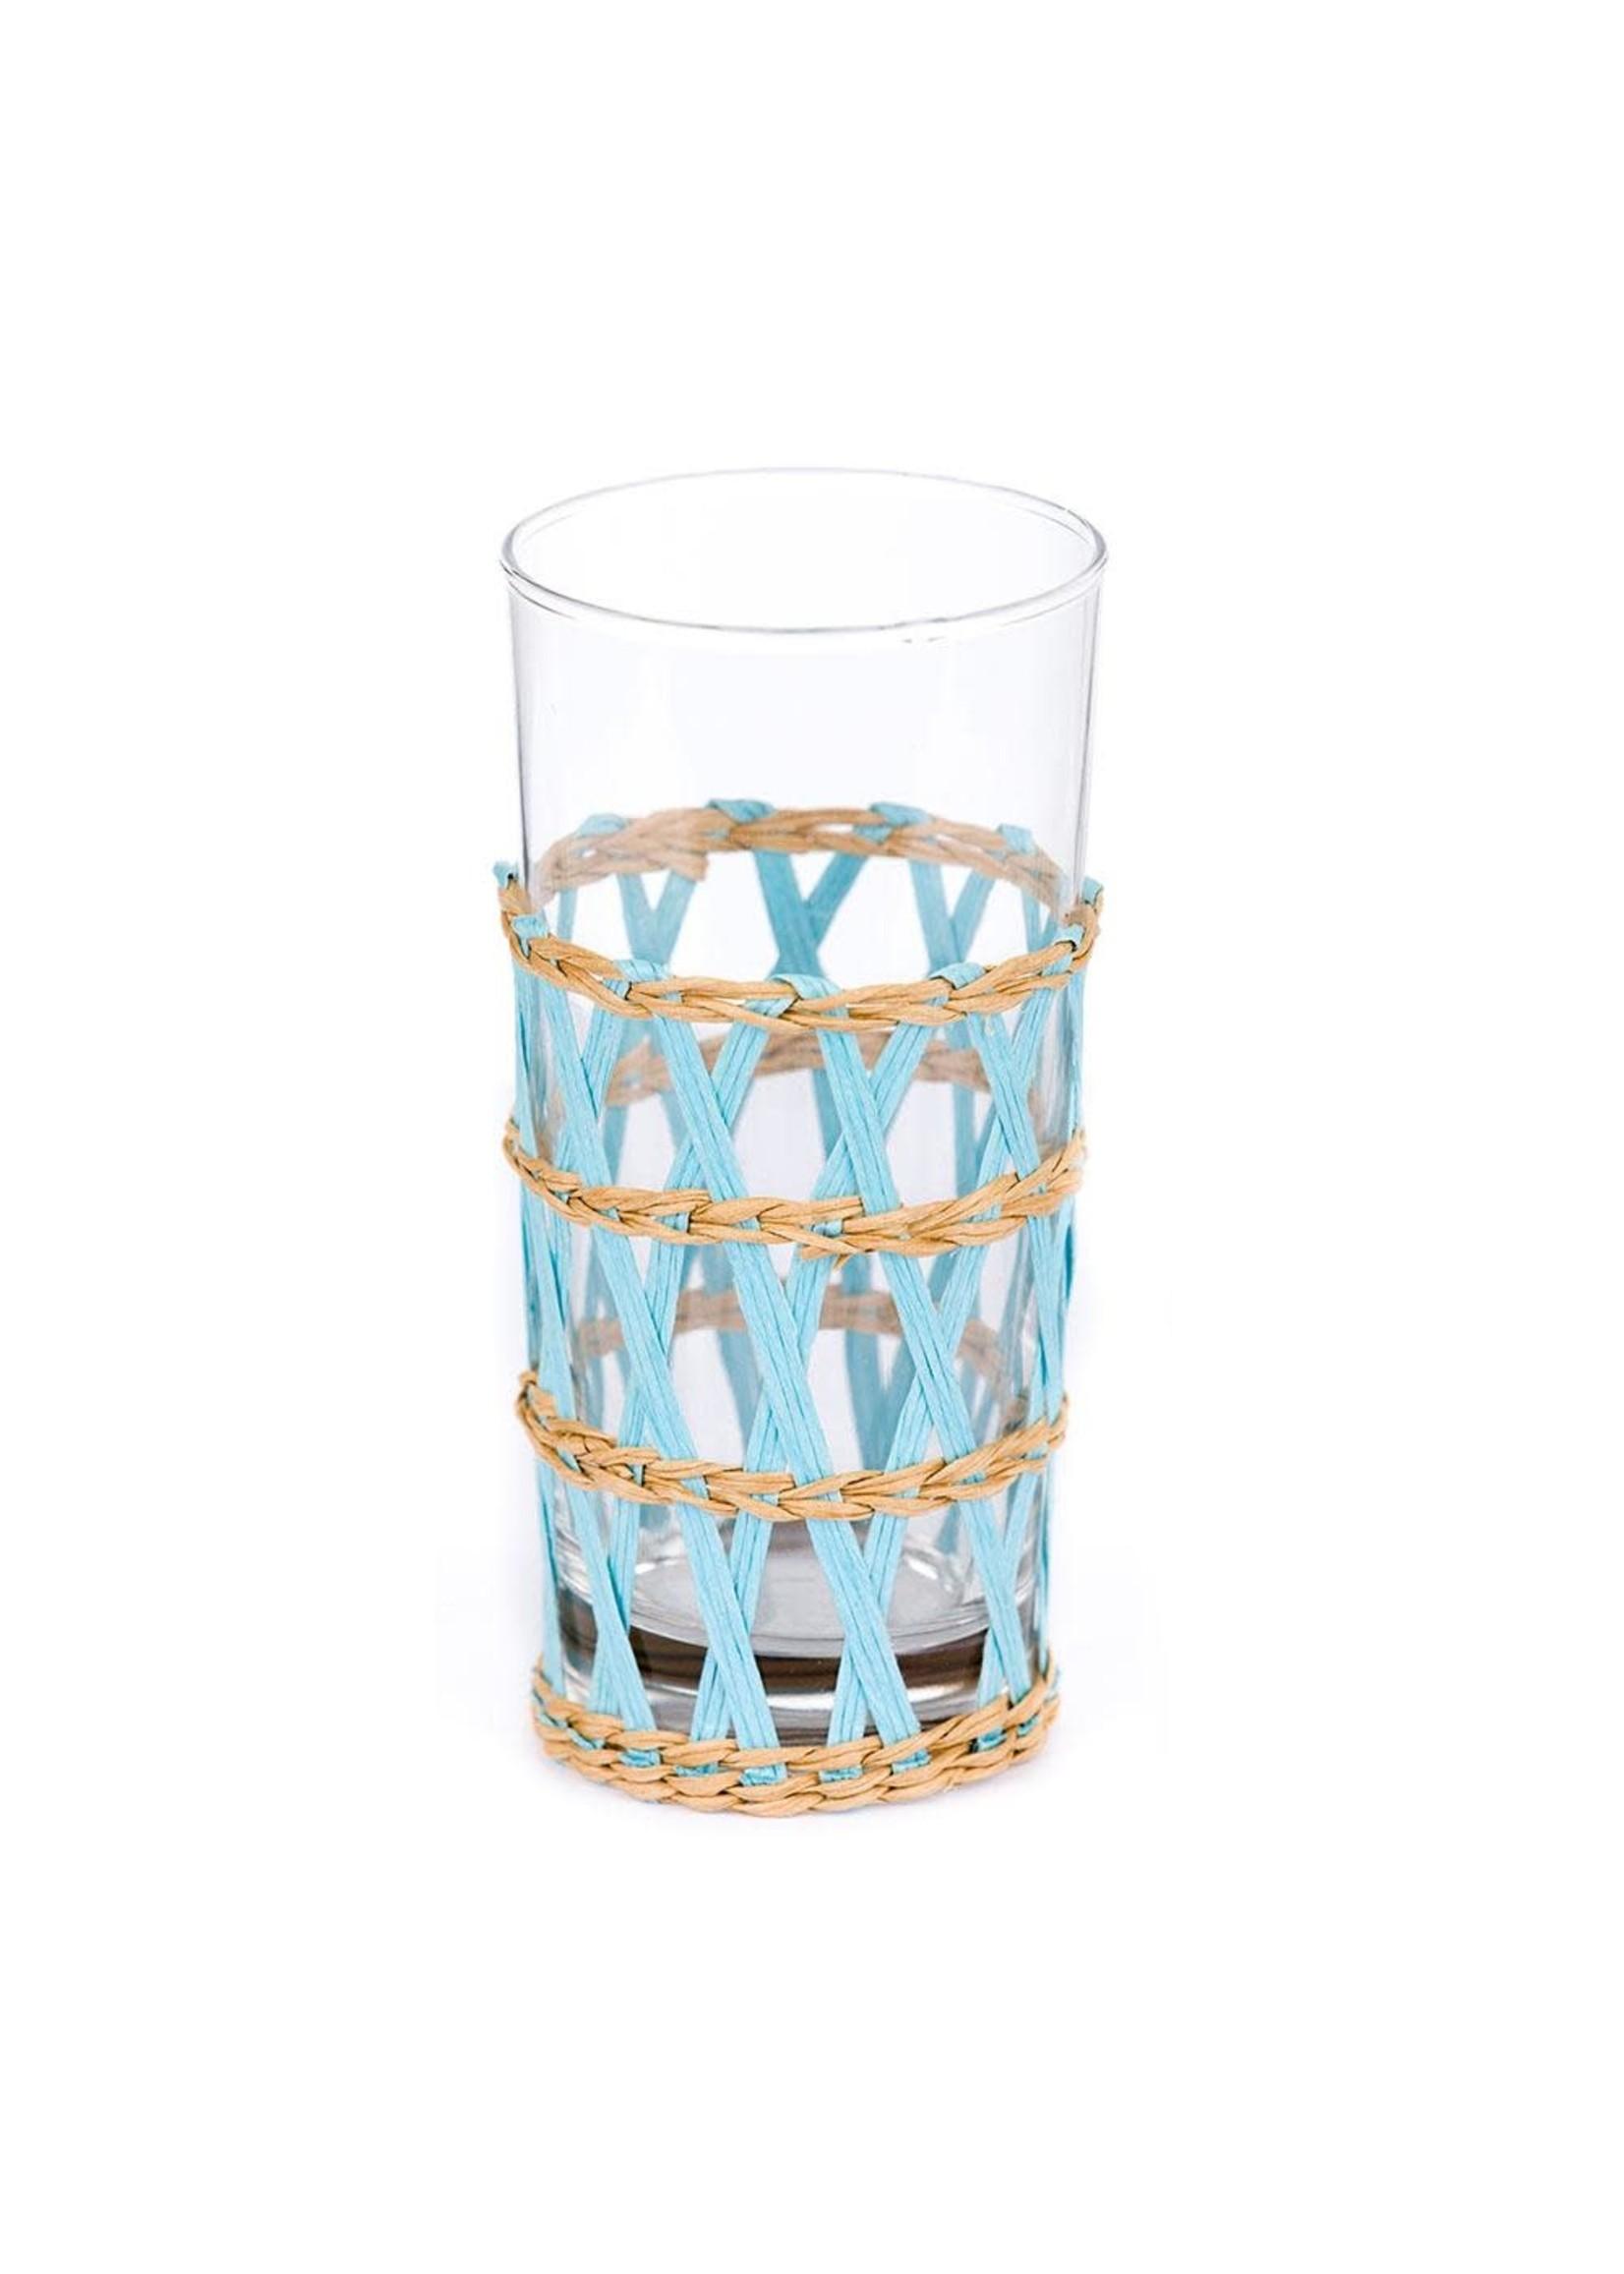 Amanda Lindroth Island Wrapped Ice Tea Glass - Light Blue